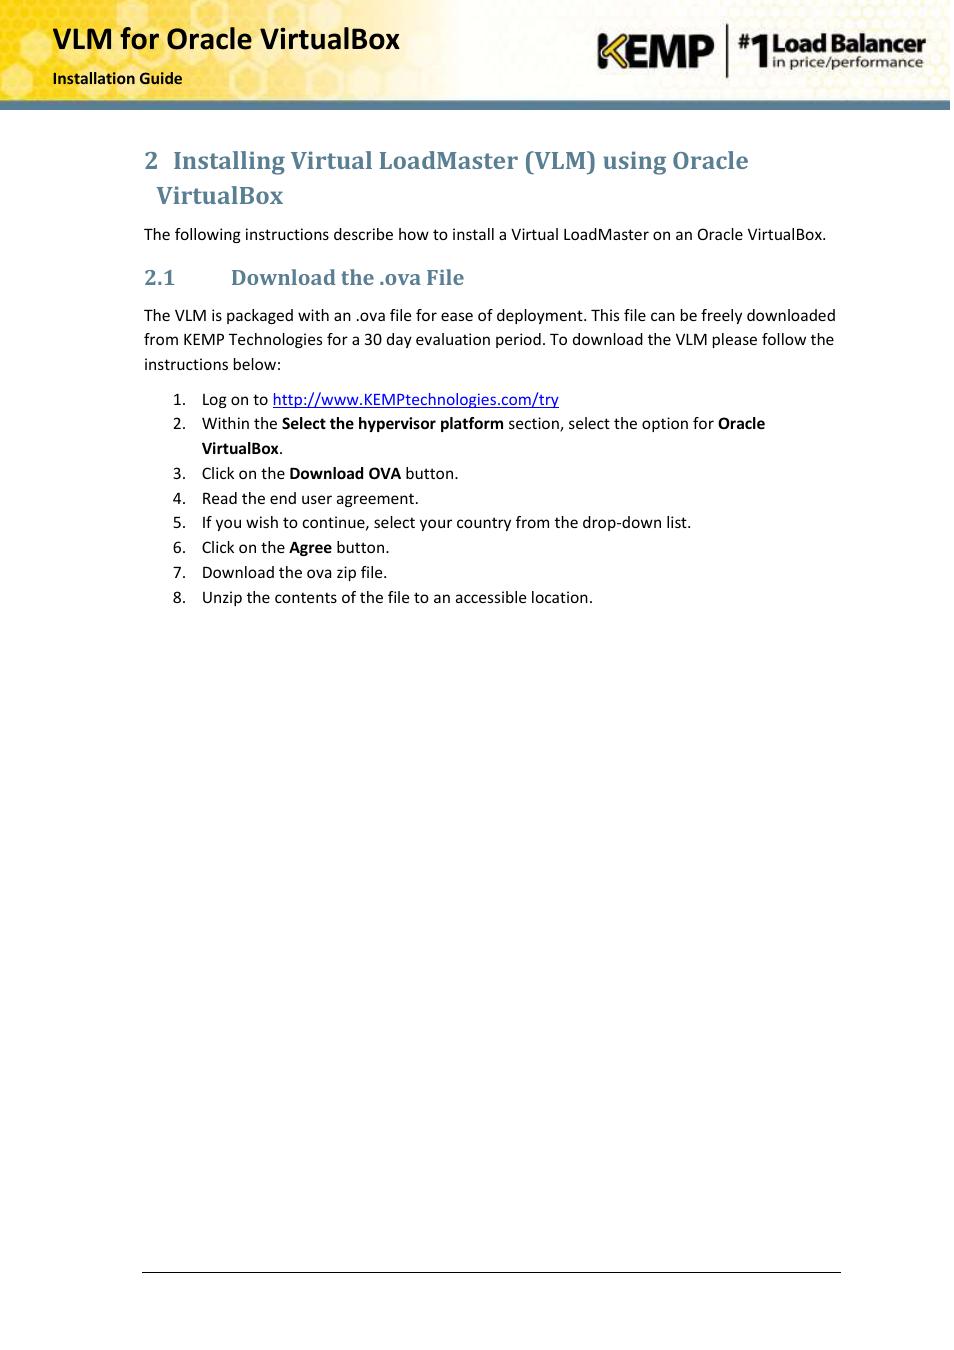 download the ova file vlm for oracle virtualbox kemp oracle rh manualsdir com virtualbox 5.1.18 user manual virtualbox user guide pdf